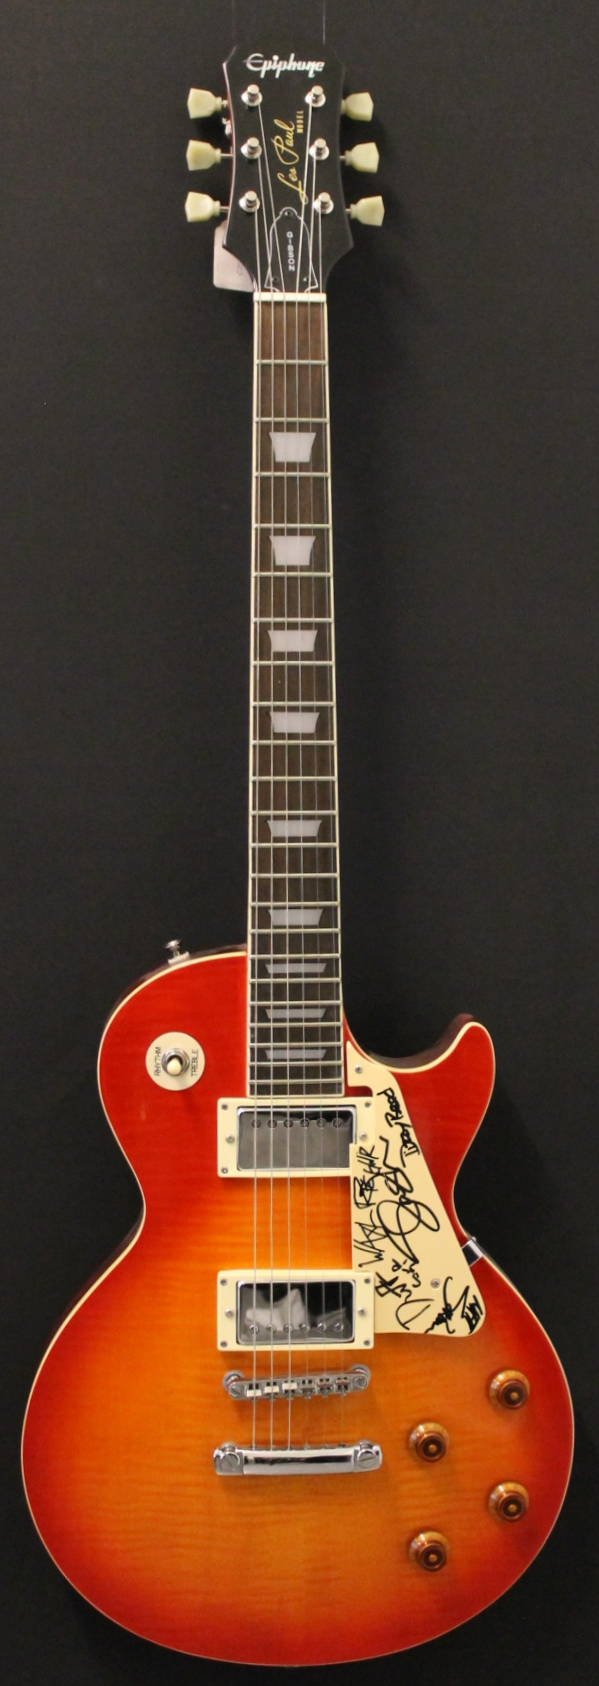 epiphone guns n roses autographed les paul 1991 guitar for sale kitarakuu. Black Bedroom Furniture Sets. Home Design Ideas